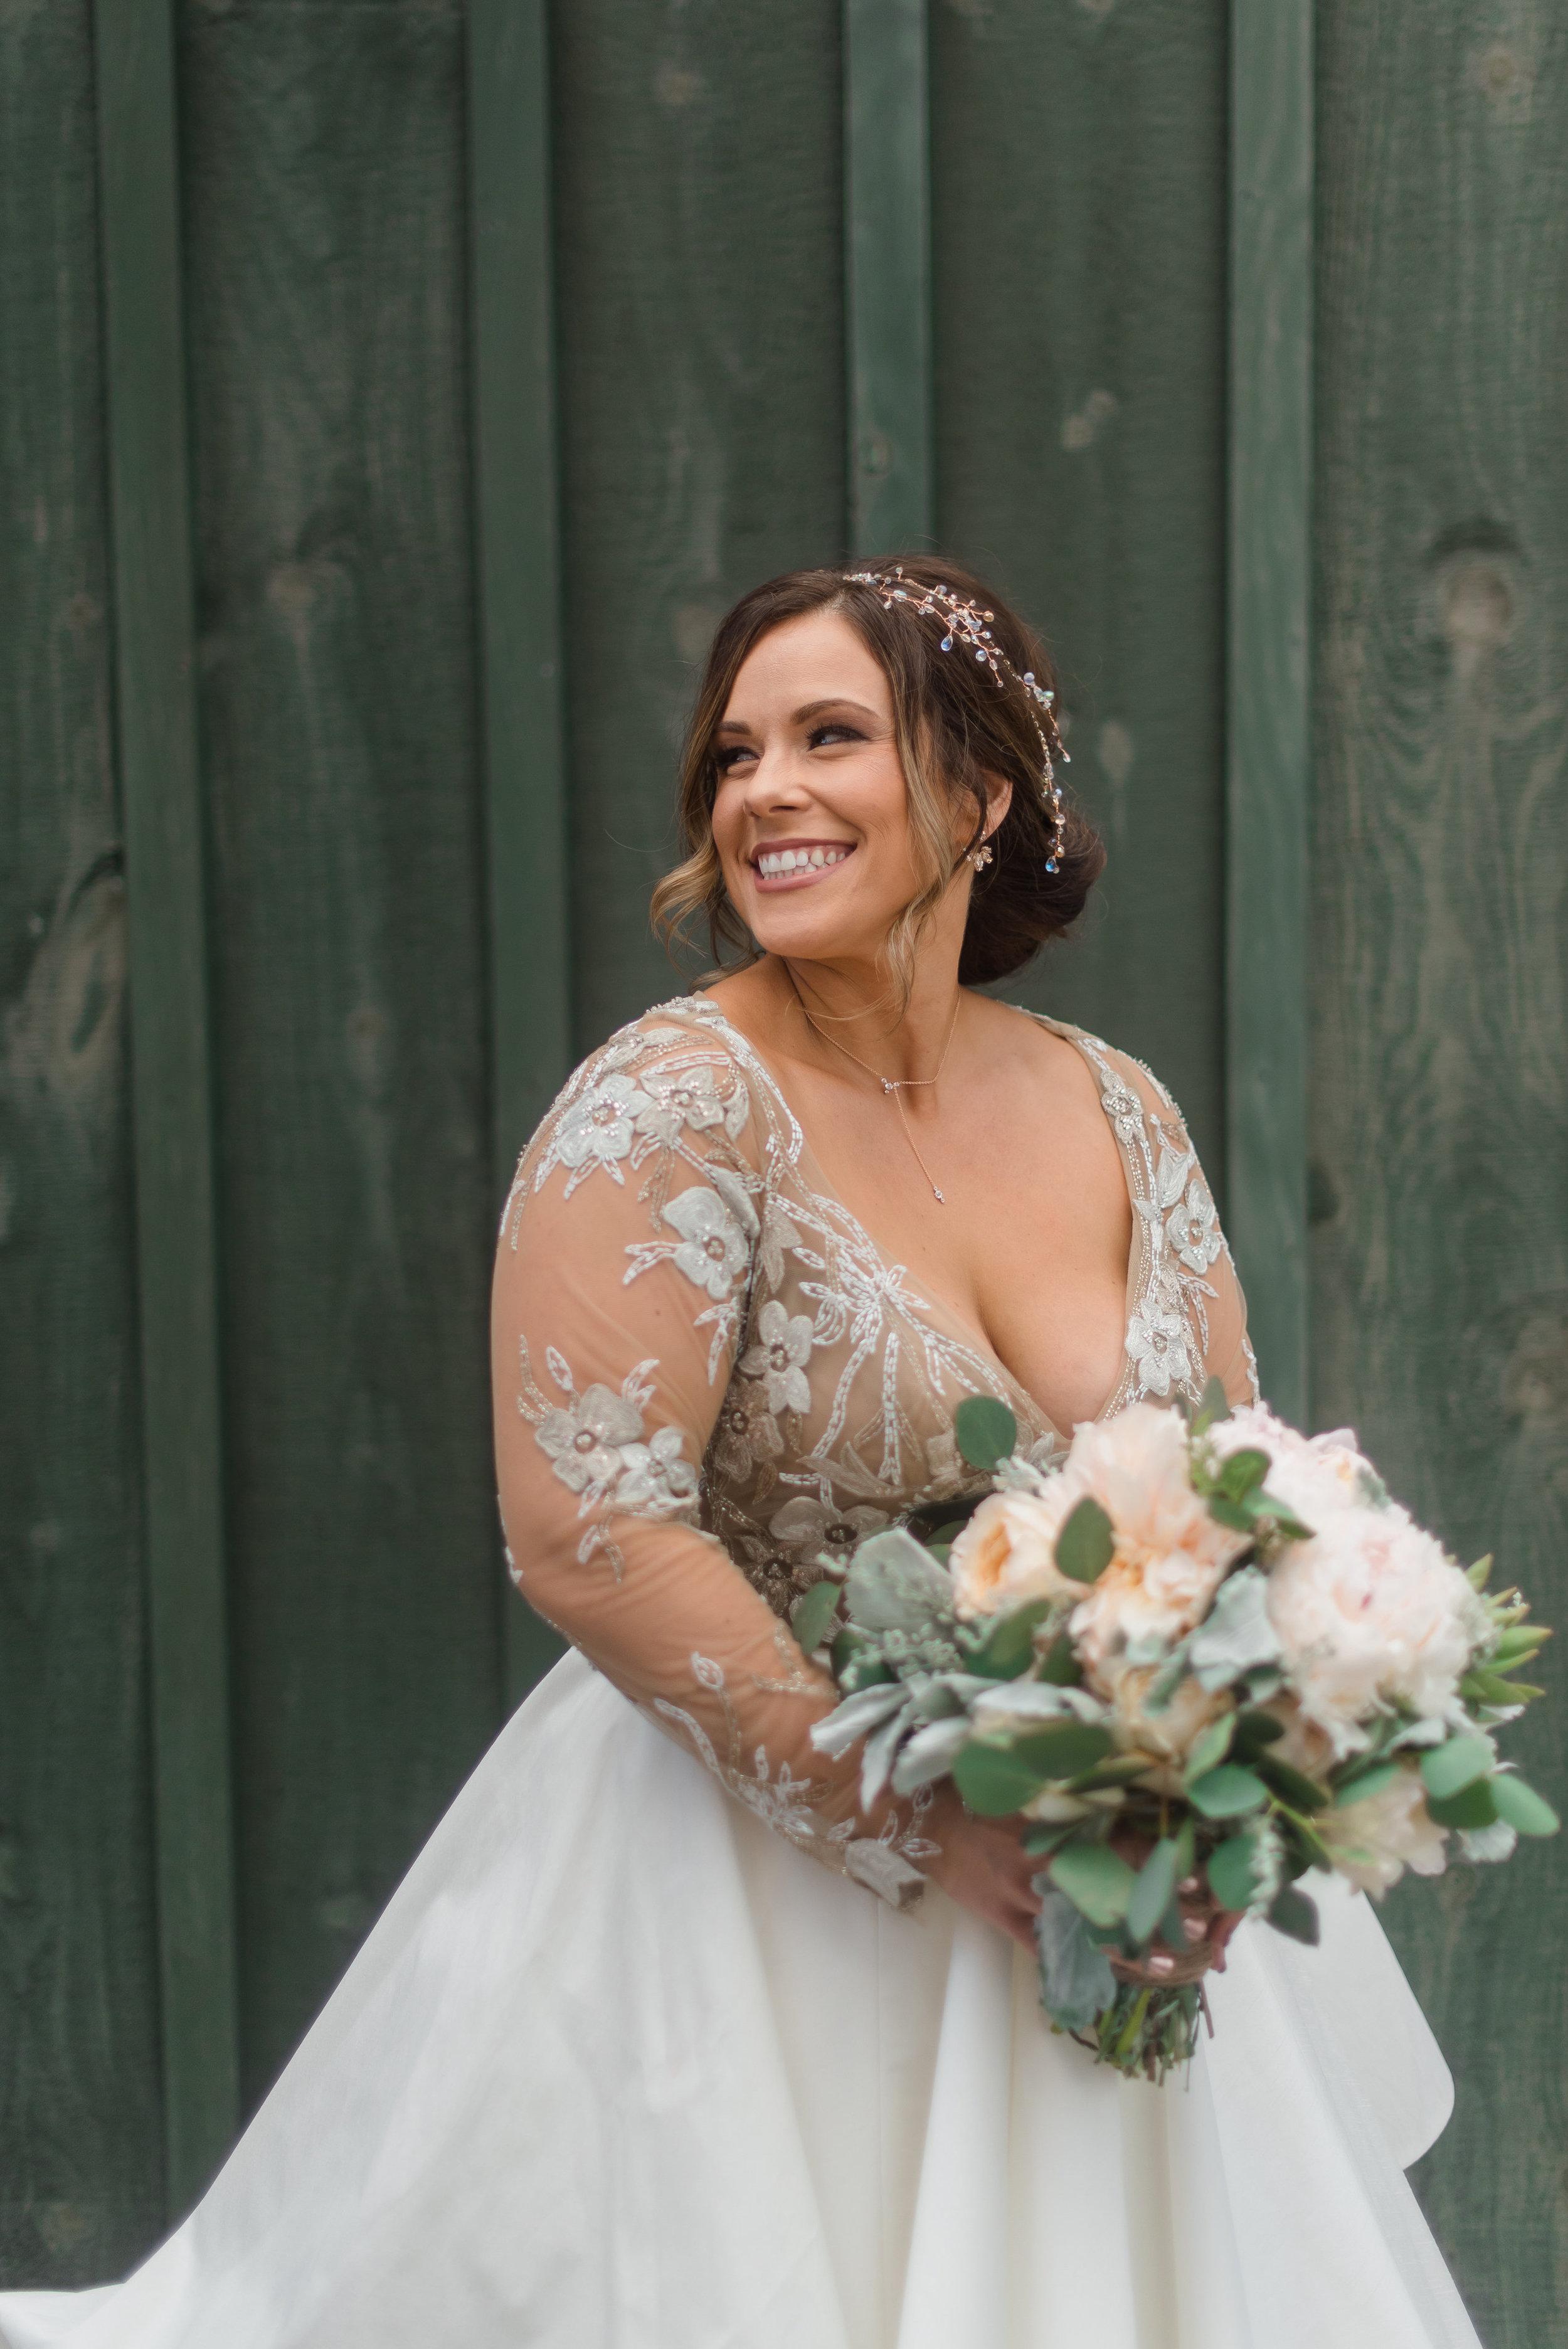 lancaster-wedding-photographer-corkfactory-hotel-industrial-glam-exposedbrick-hayleypaige0216.jpg